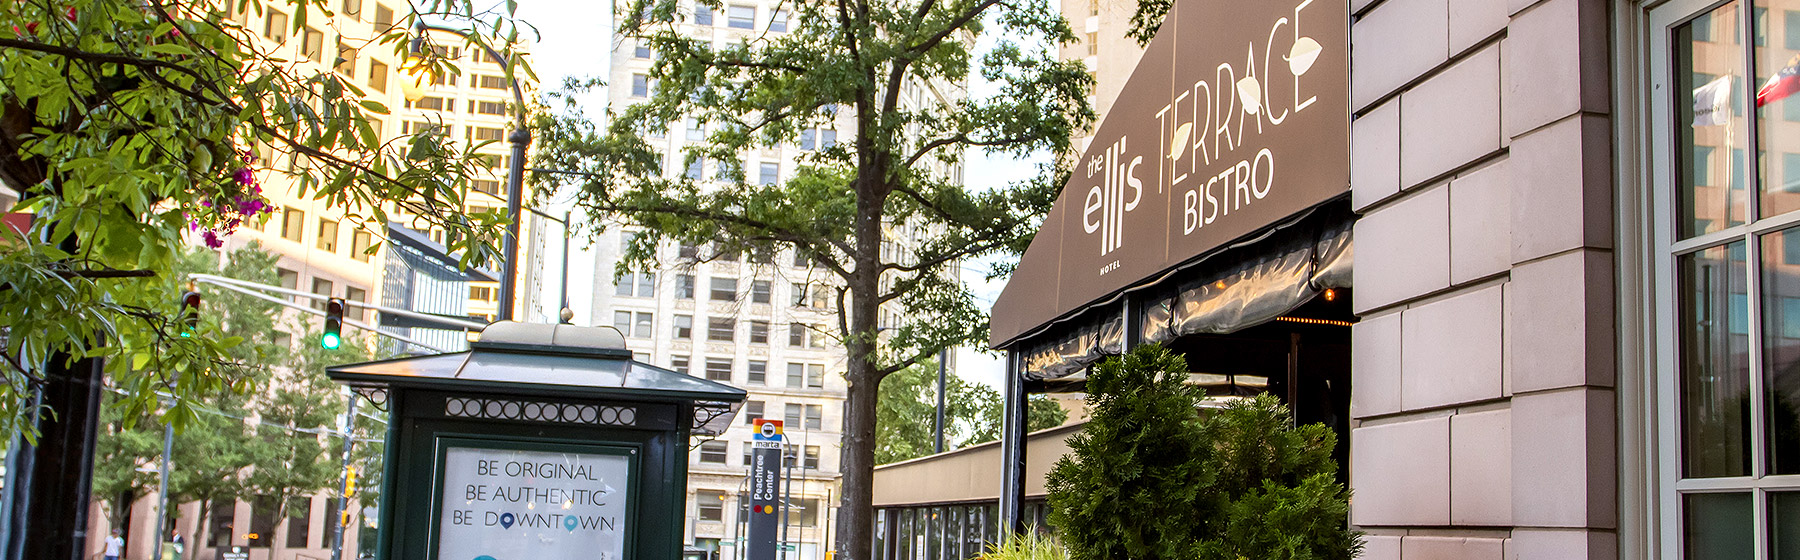 Enjoy The Ellis Hotel in Atlanta